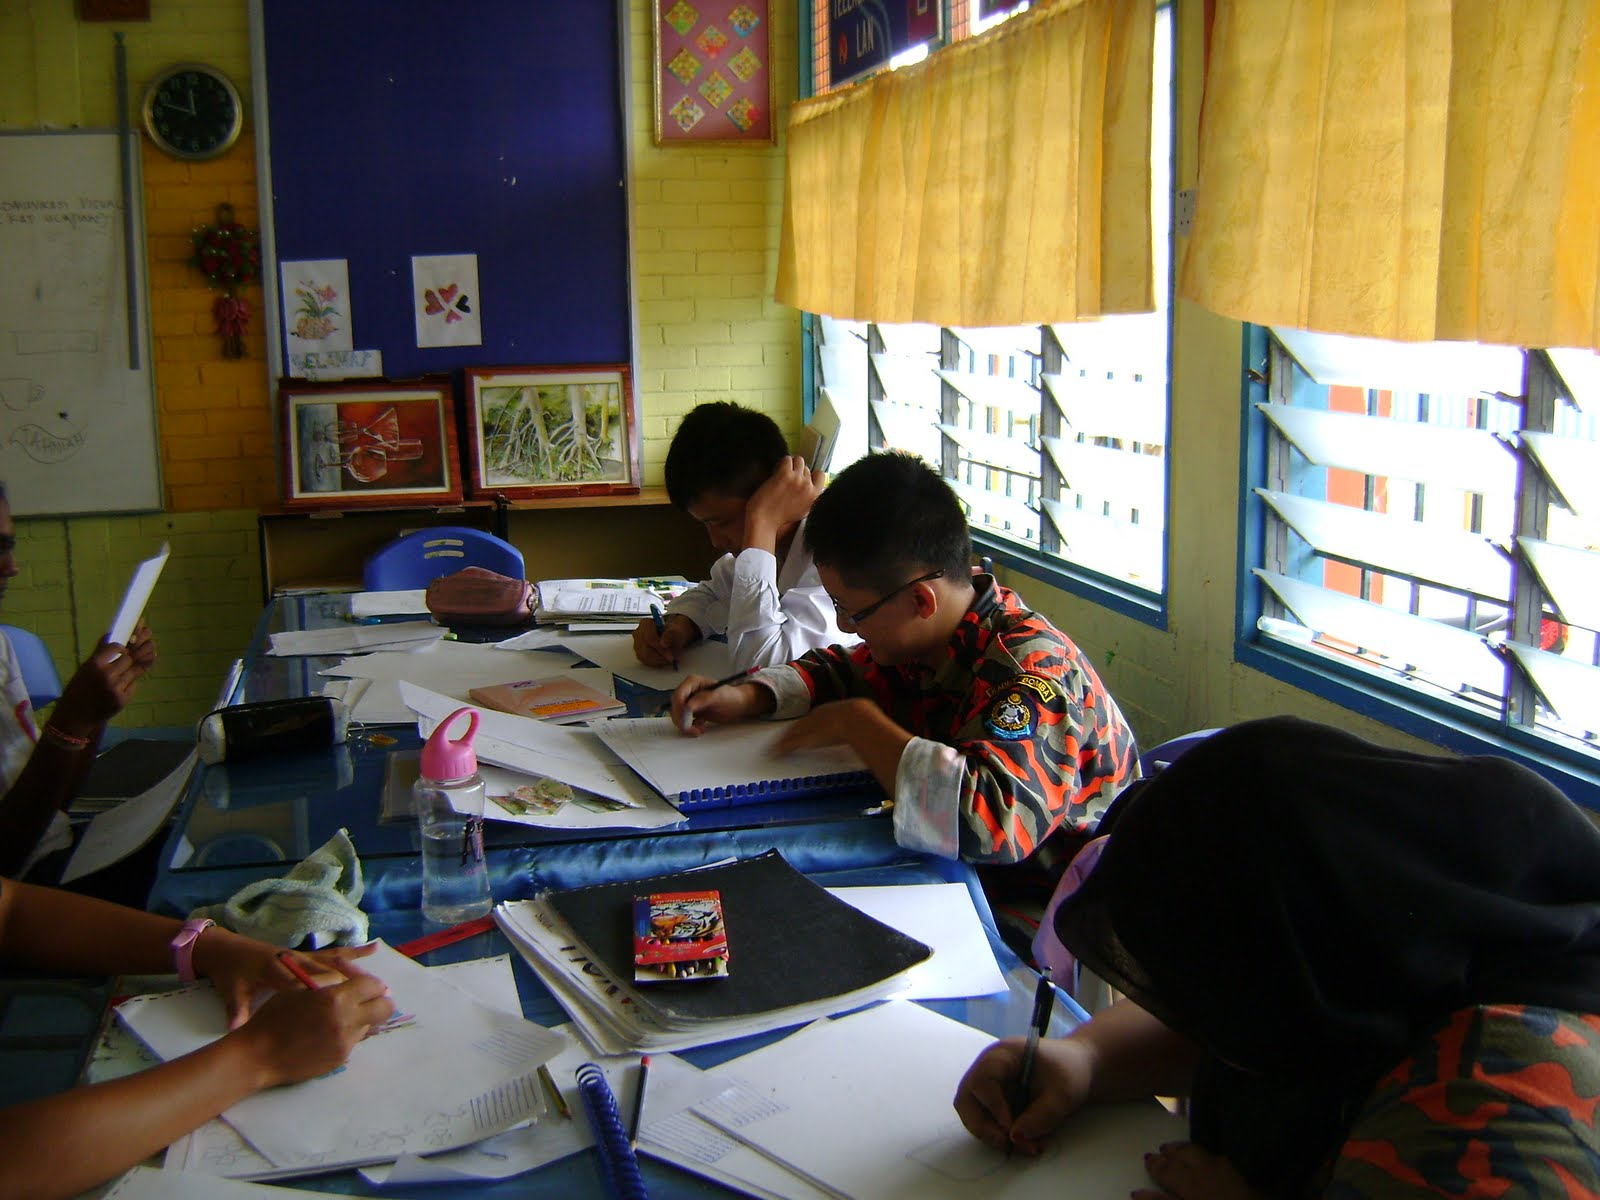 Calon-calon SPM 2011 sedang tekun menyiapkan kerja kursus.